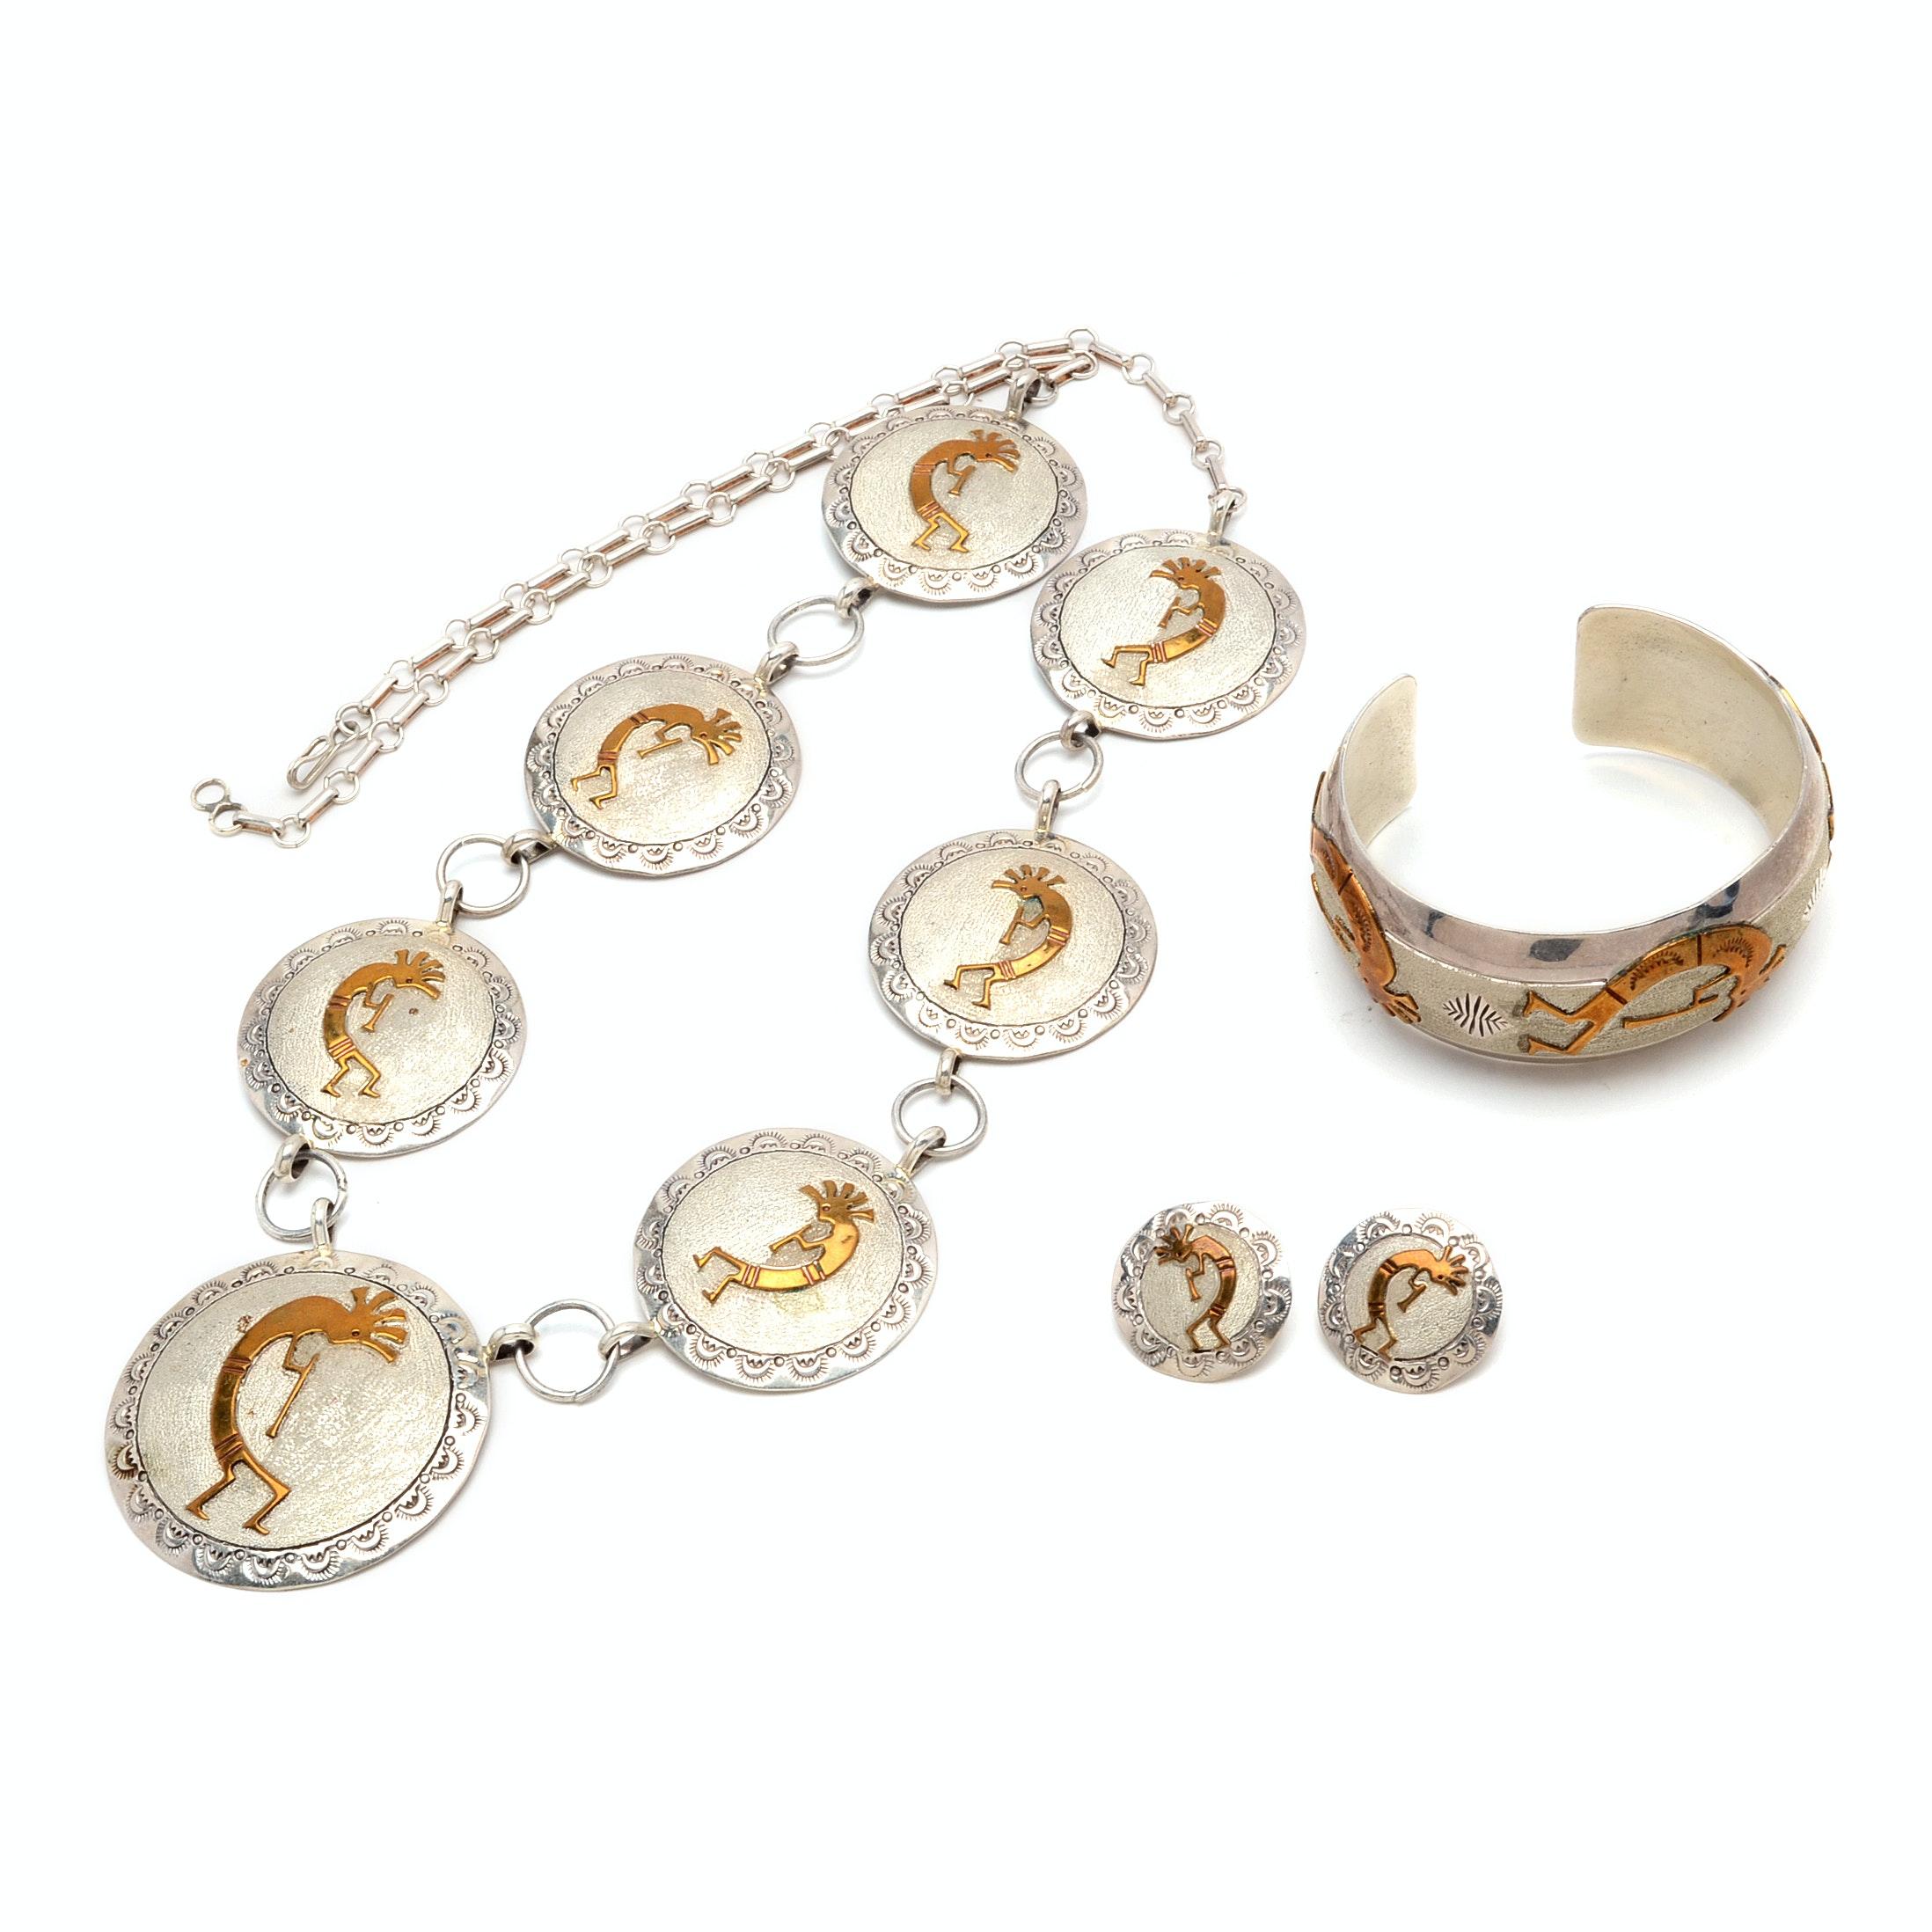 Sterling Silver Kokopelli Medallion Necklace, Earrings and Cuff Bracelet